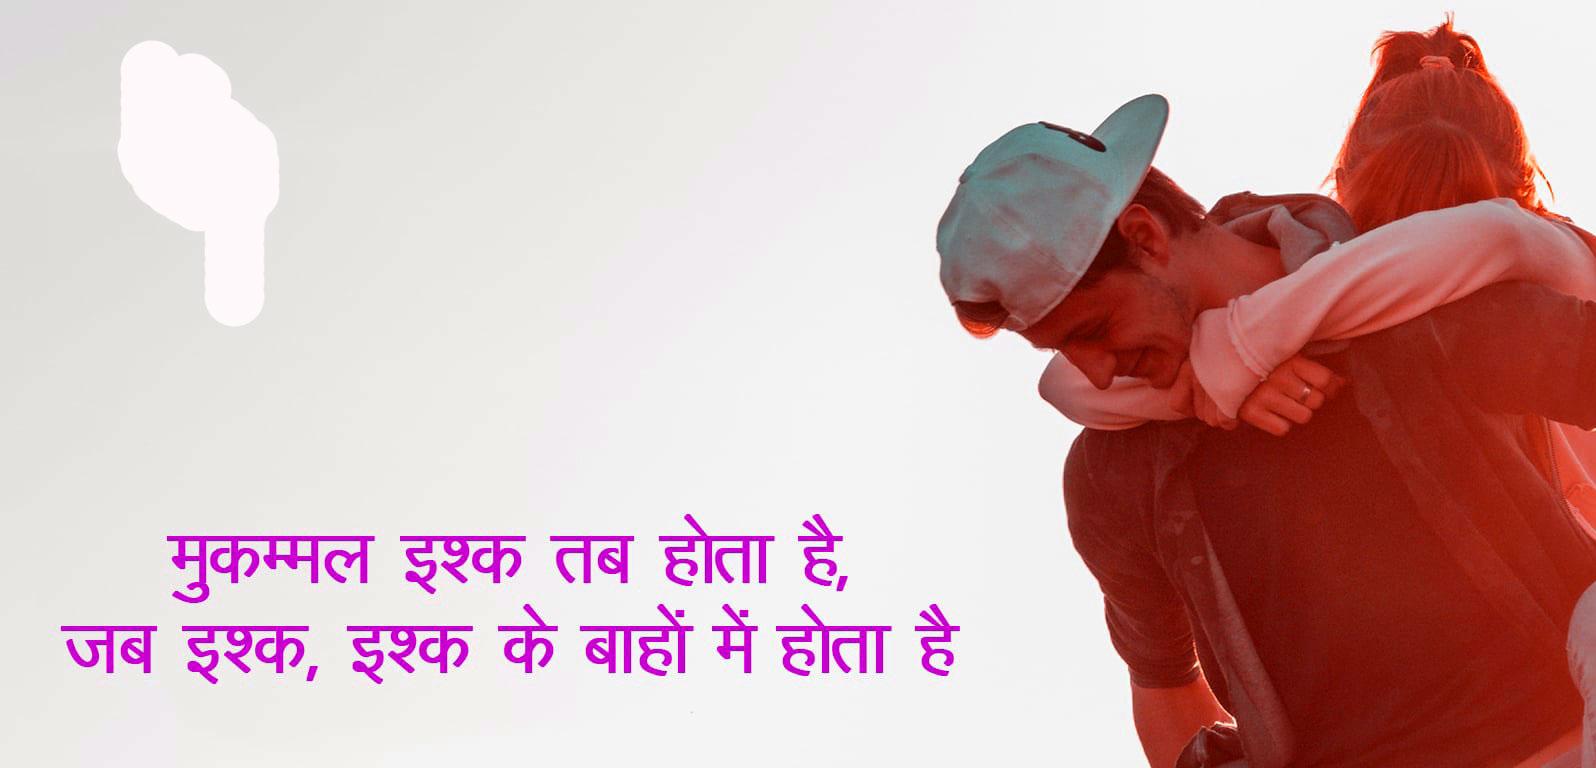 Free Hindi Love Couple Whatsapp Dp Wallpaper Download